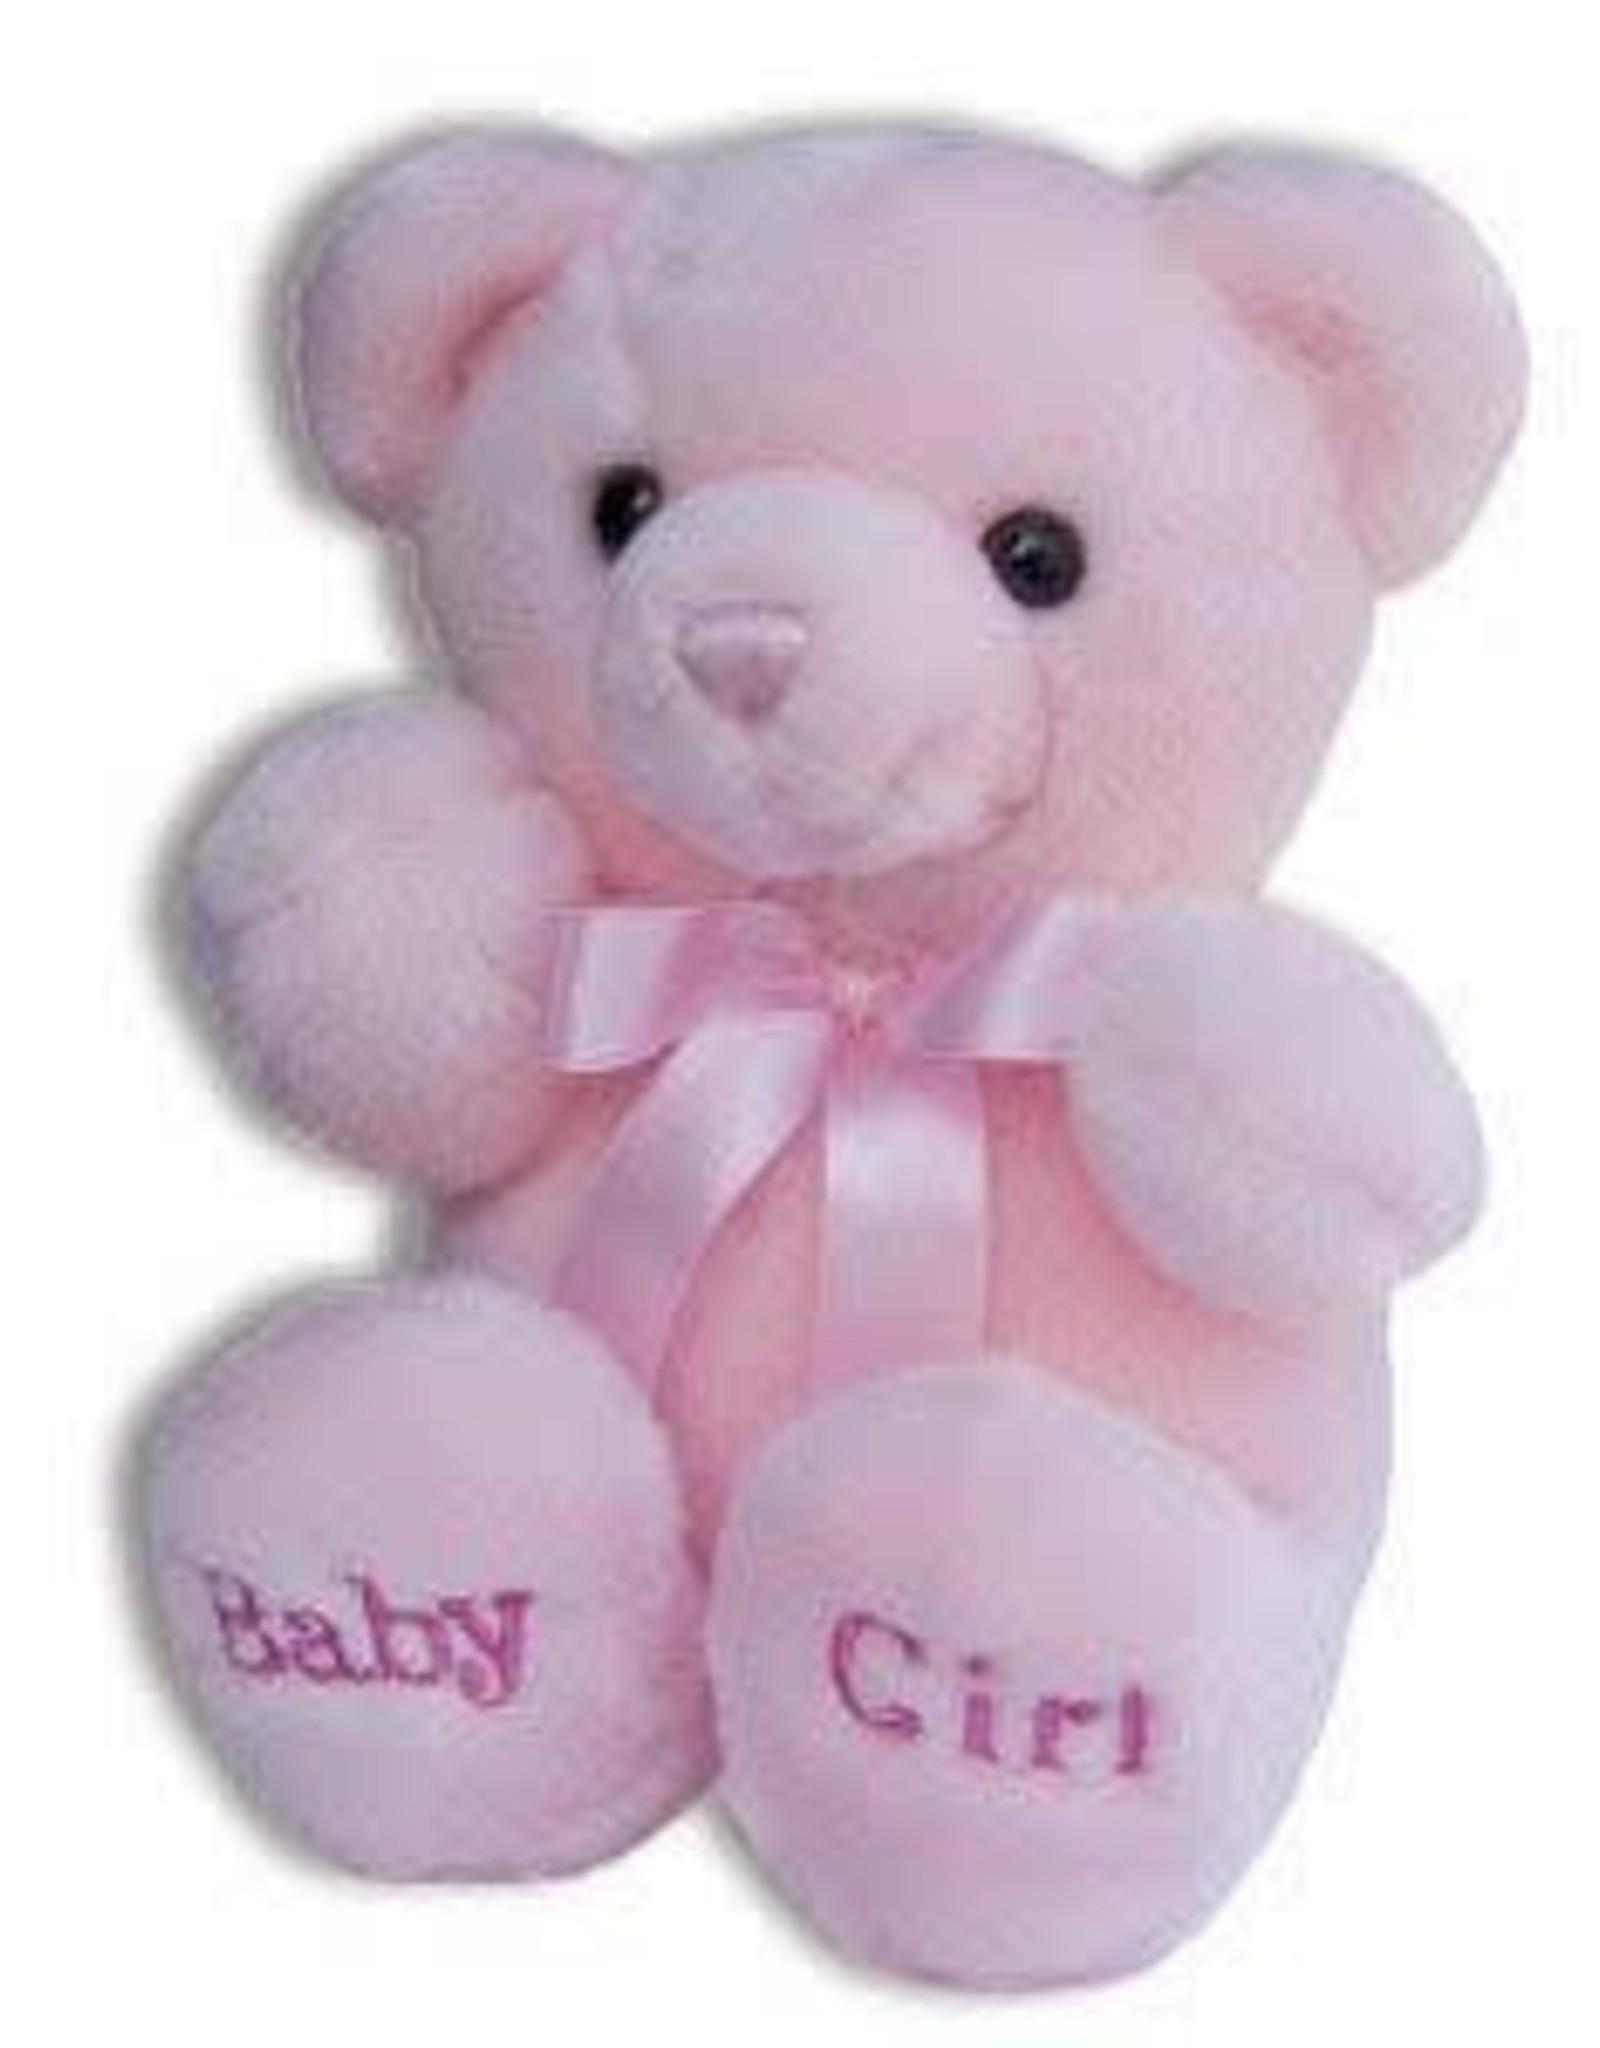 KELLI'S PINK BABY GIRL PLUSH COMFY BEAR